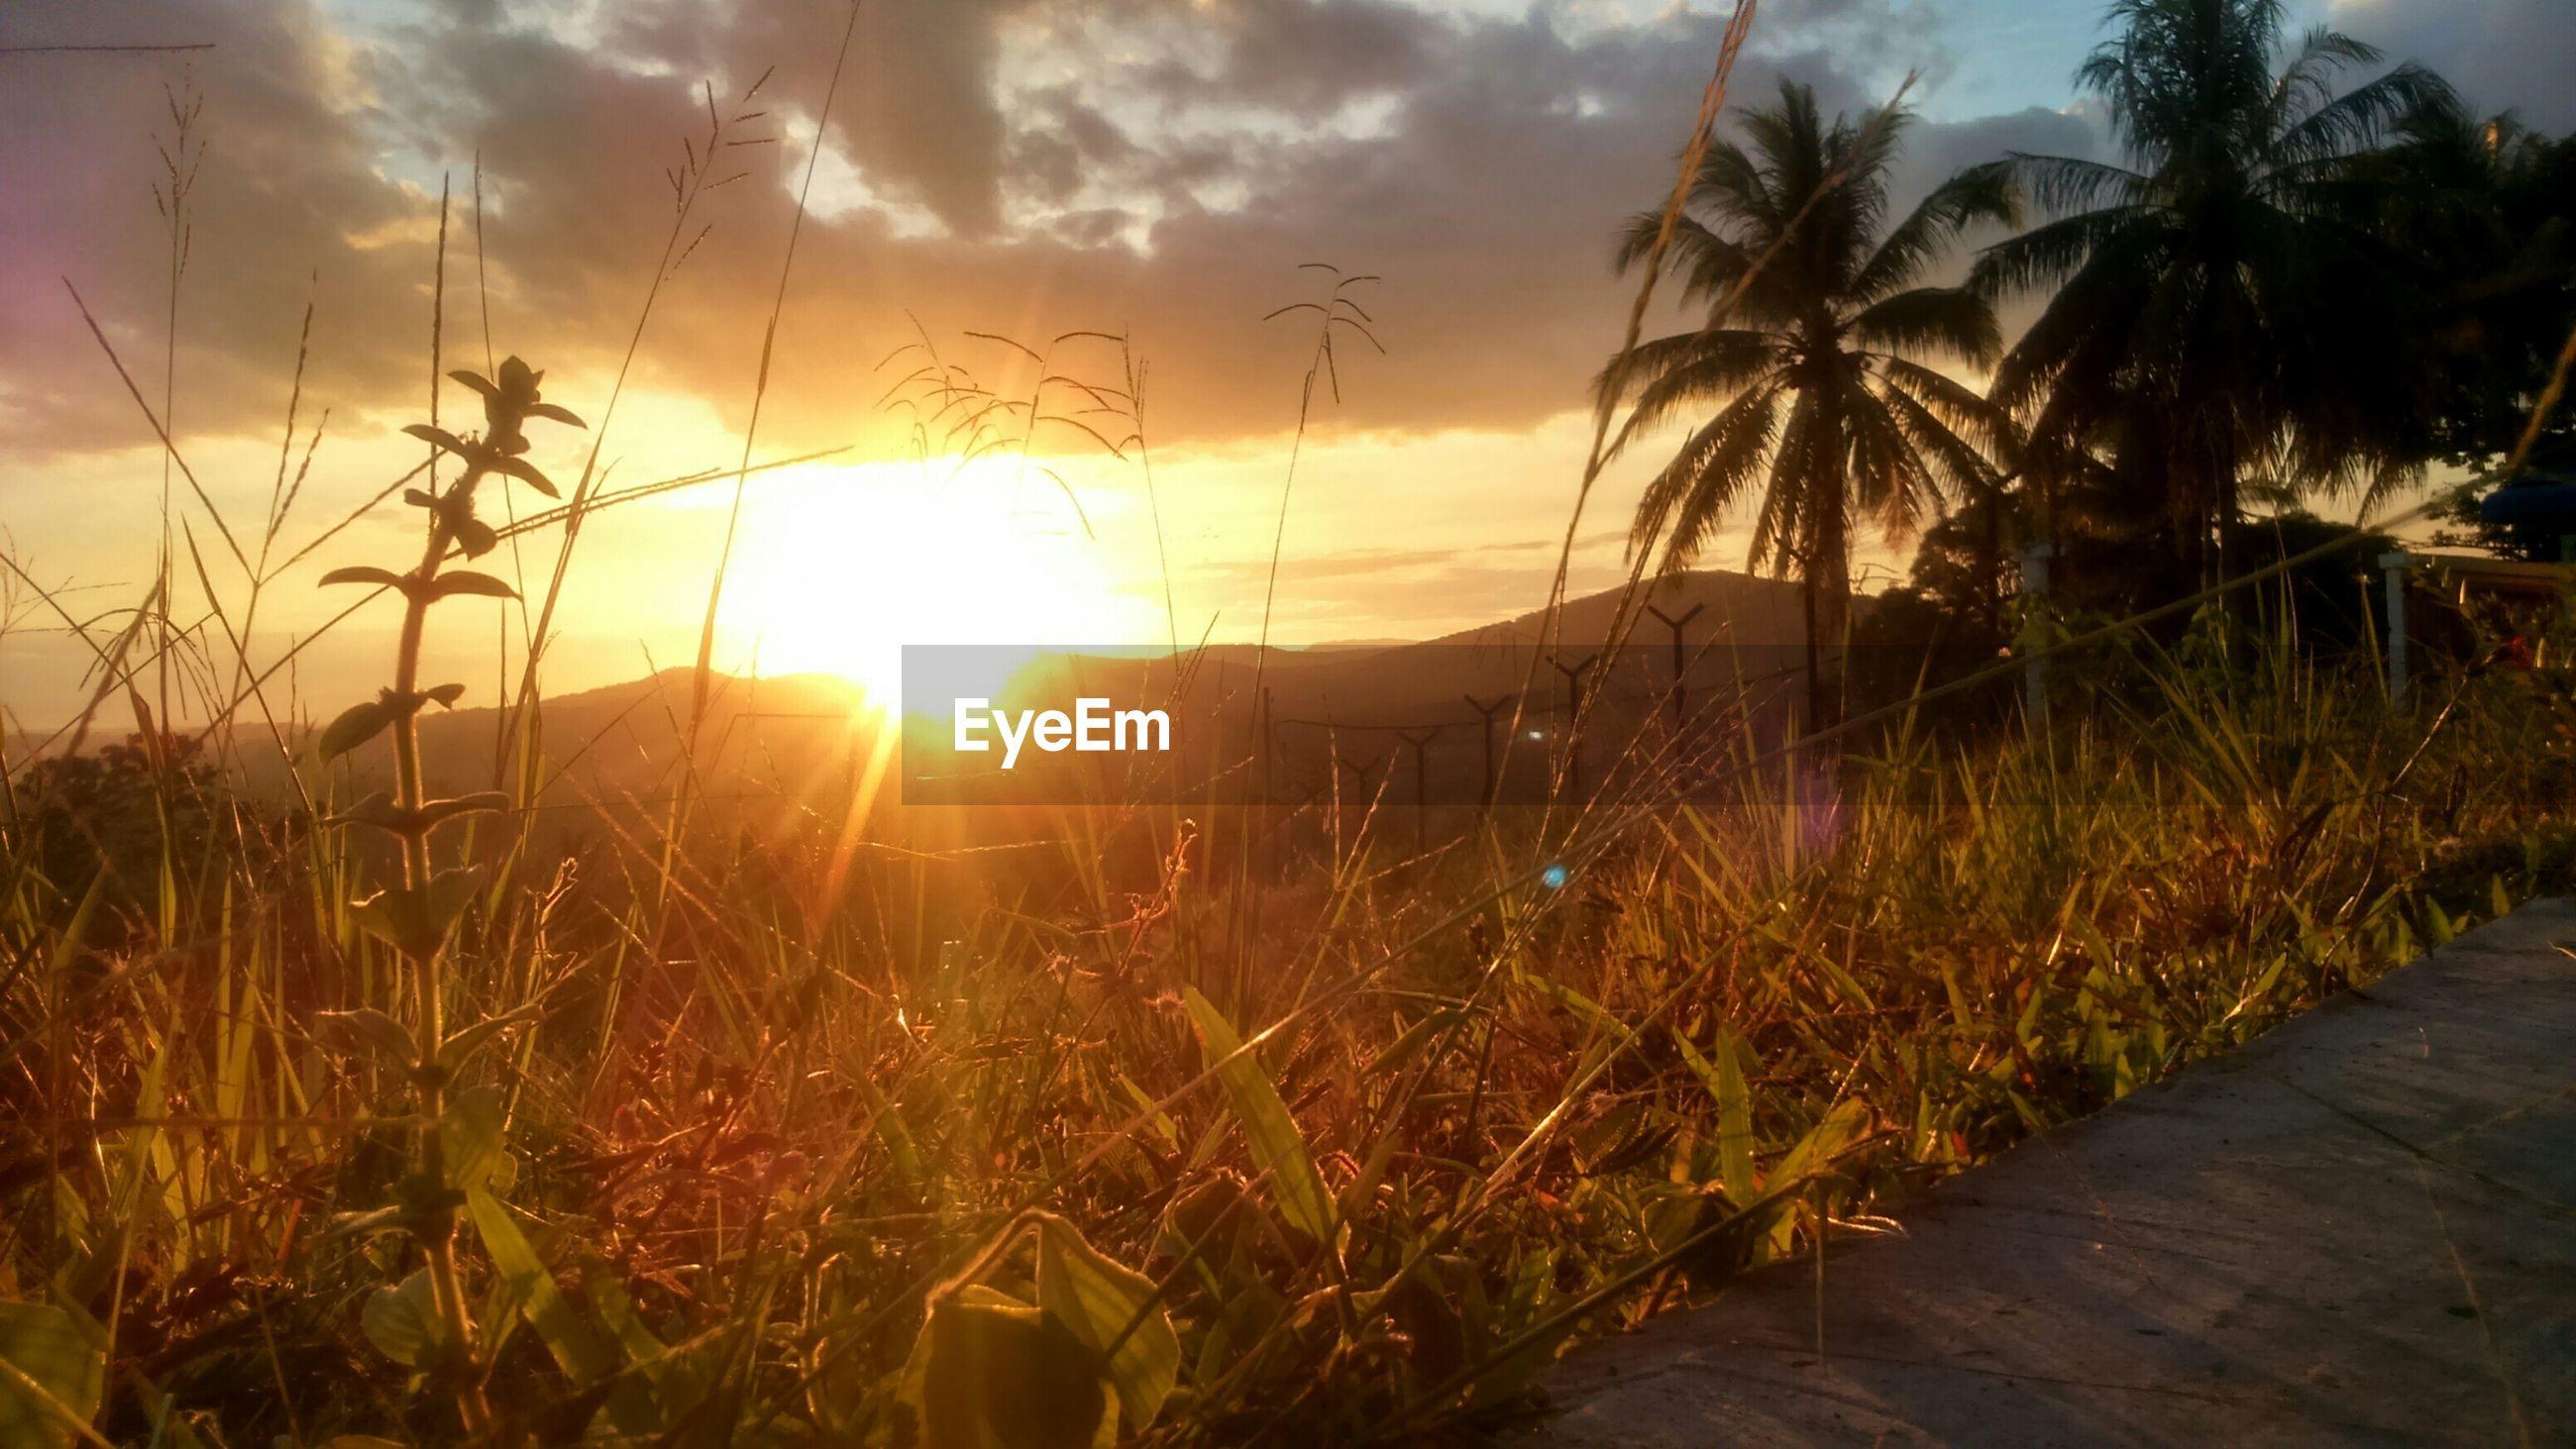 sun, sunset, sky, tranquility, sunlight, tranquil scene, sunbeam, beauty in nature, scenics, nature, plant, grass, lens flare, growth, cloud - sky, idyllic, water, orange color, field, cloud